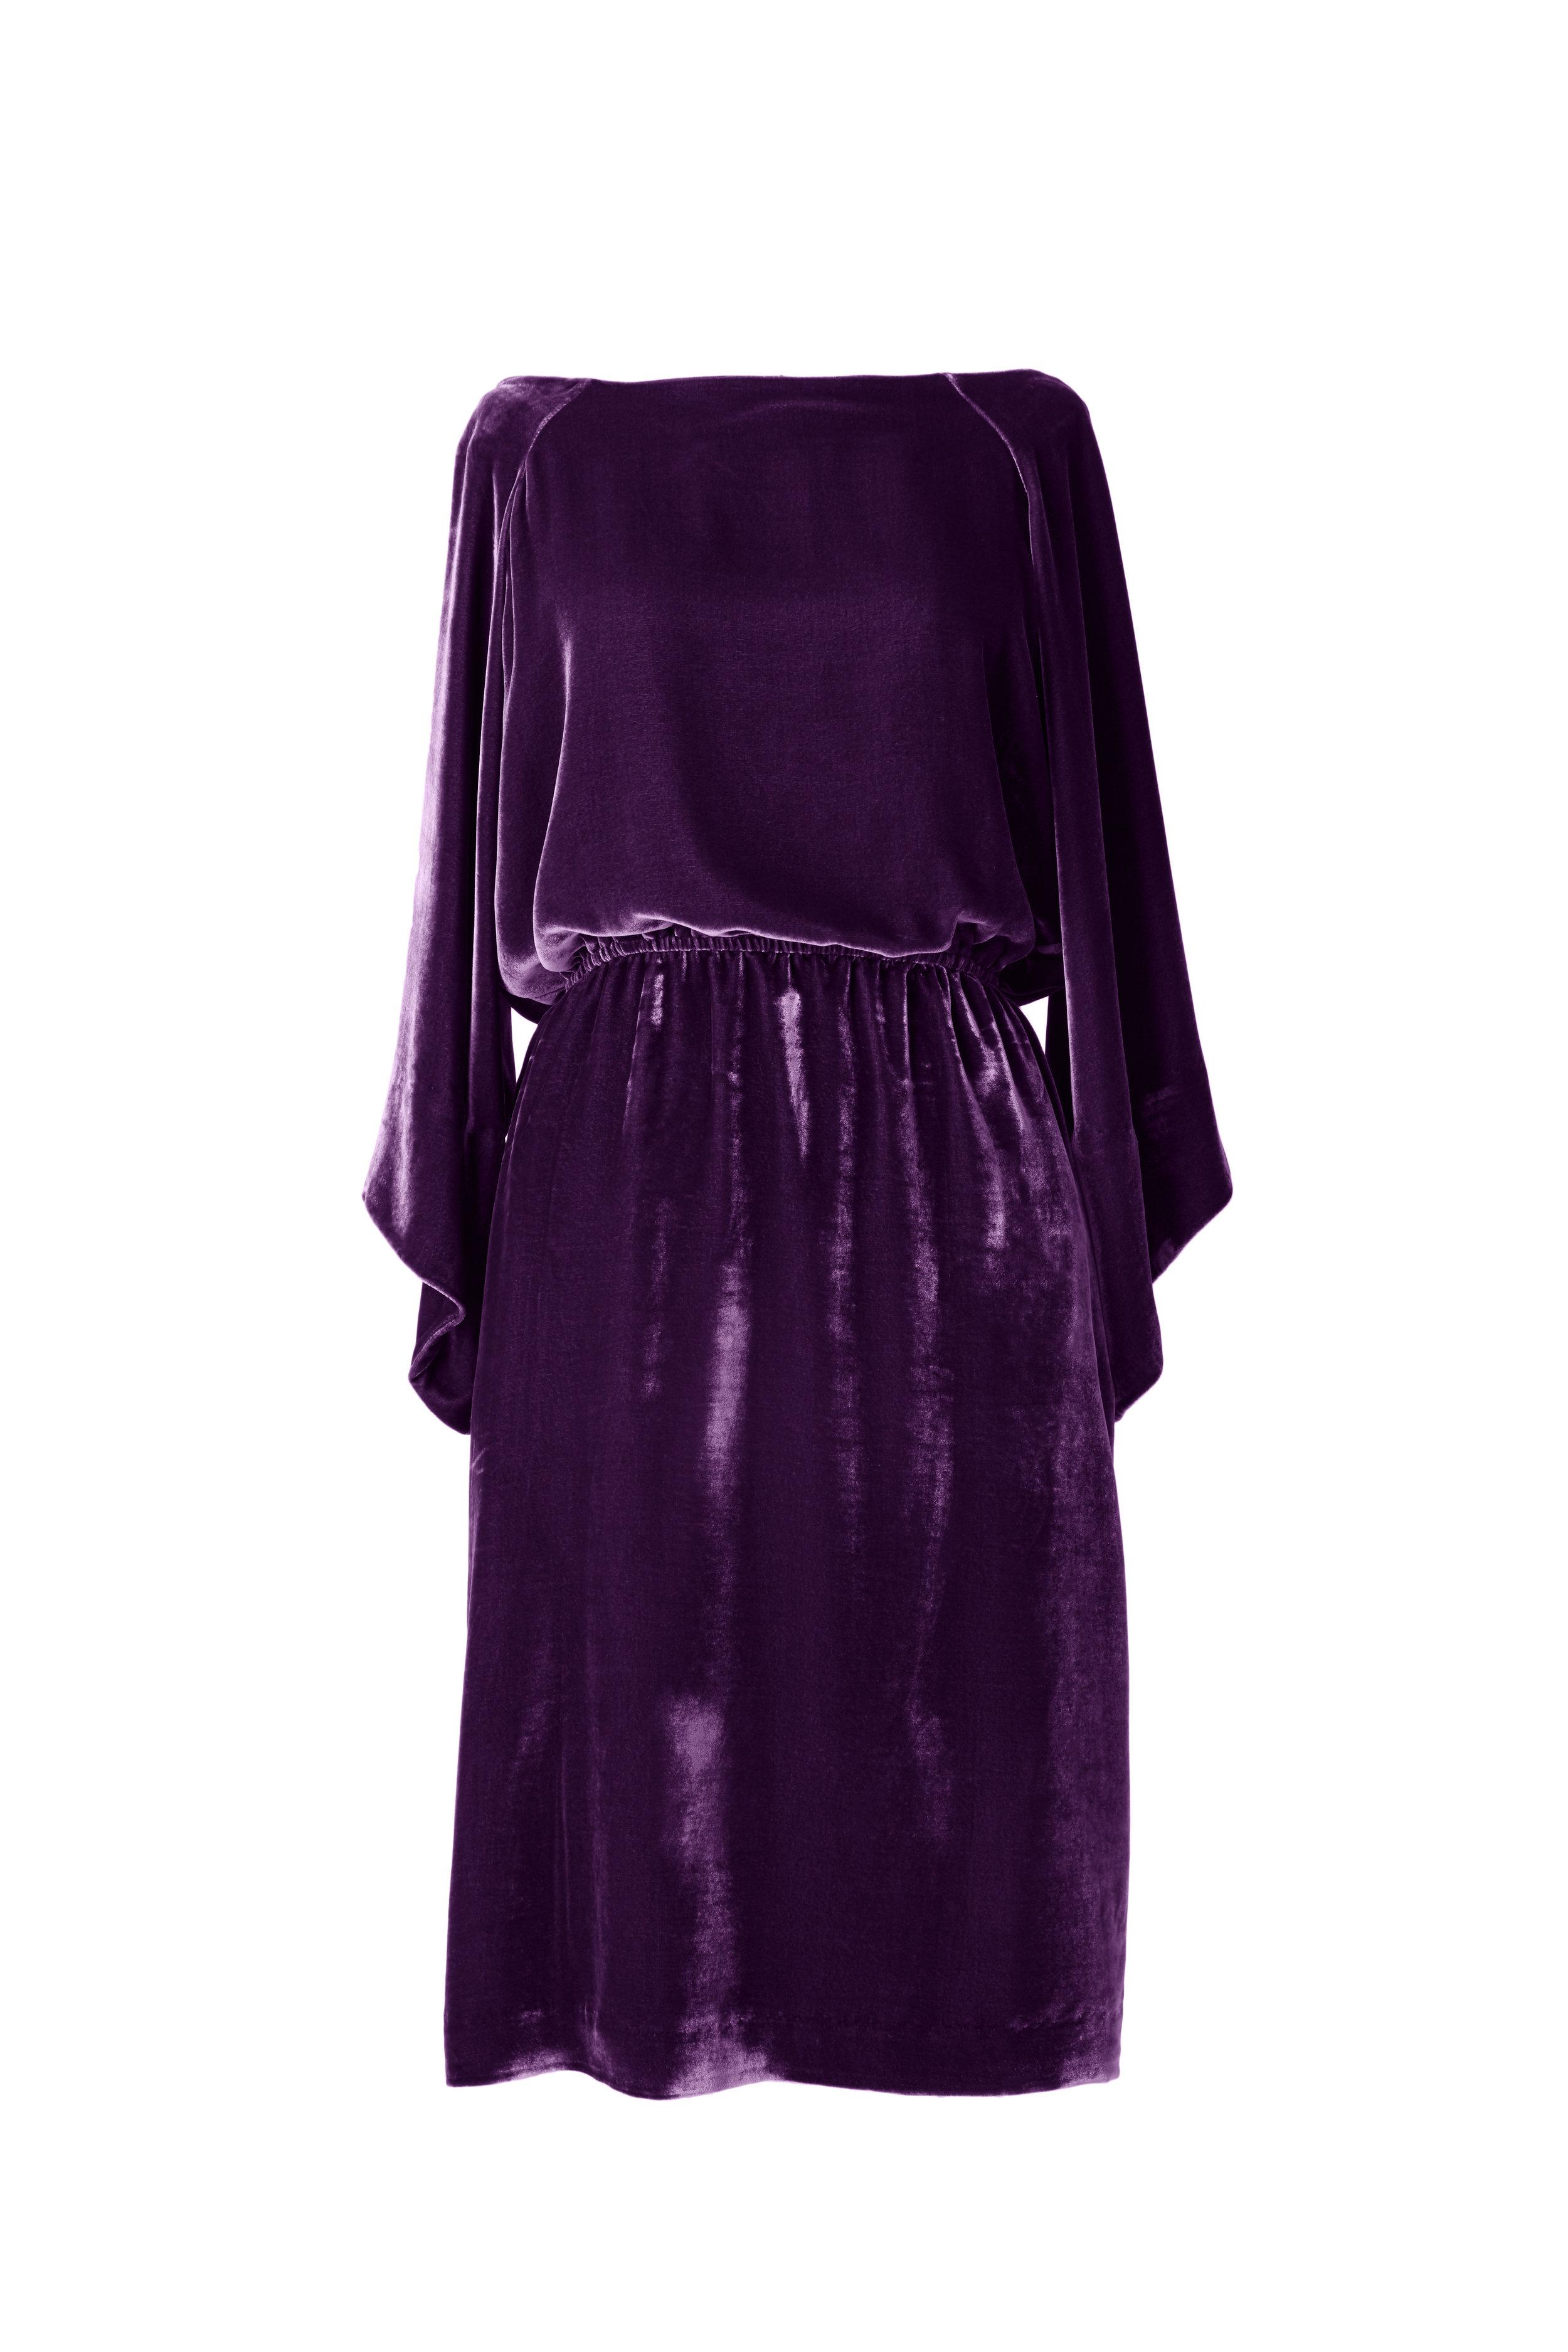 Erika 3303 Purple Velvet